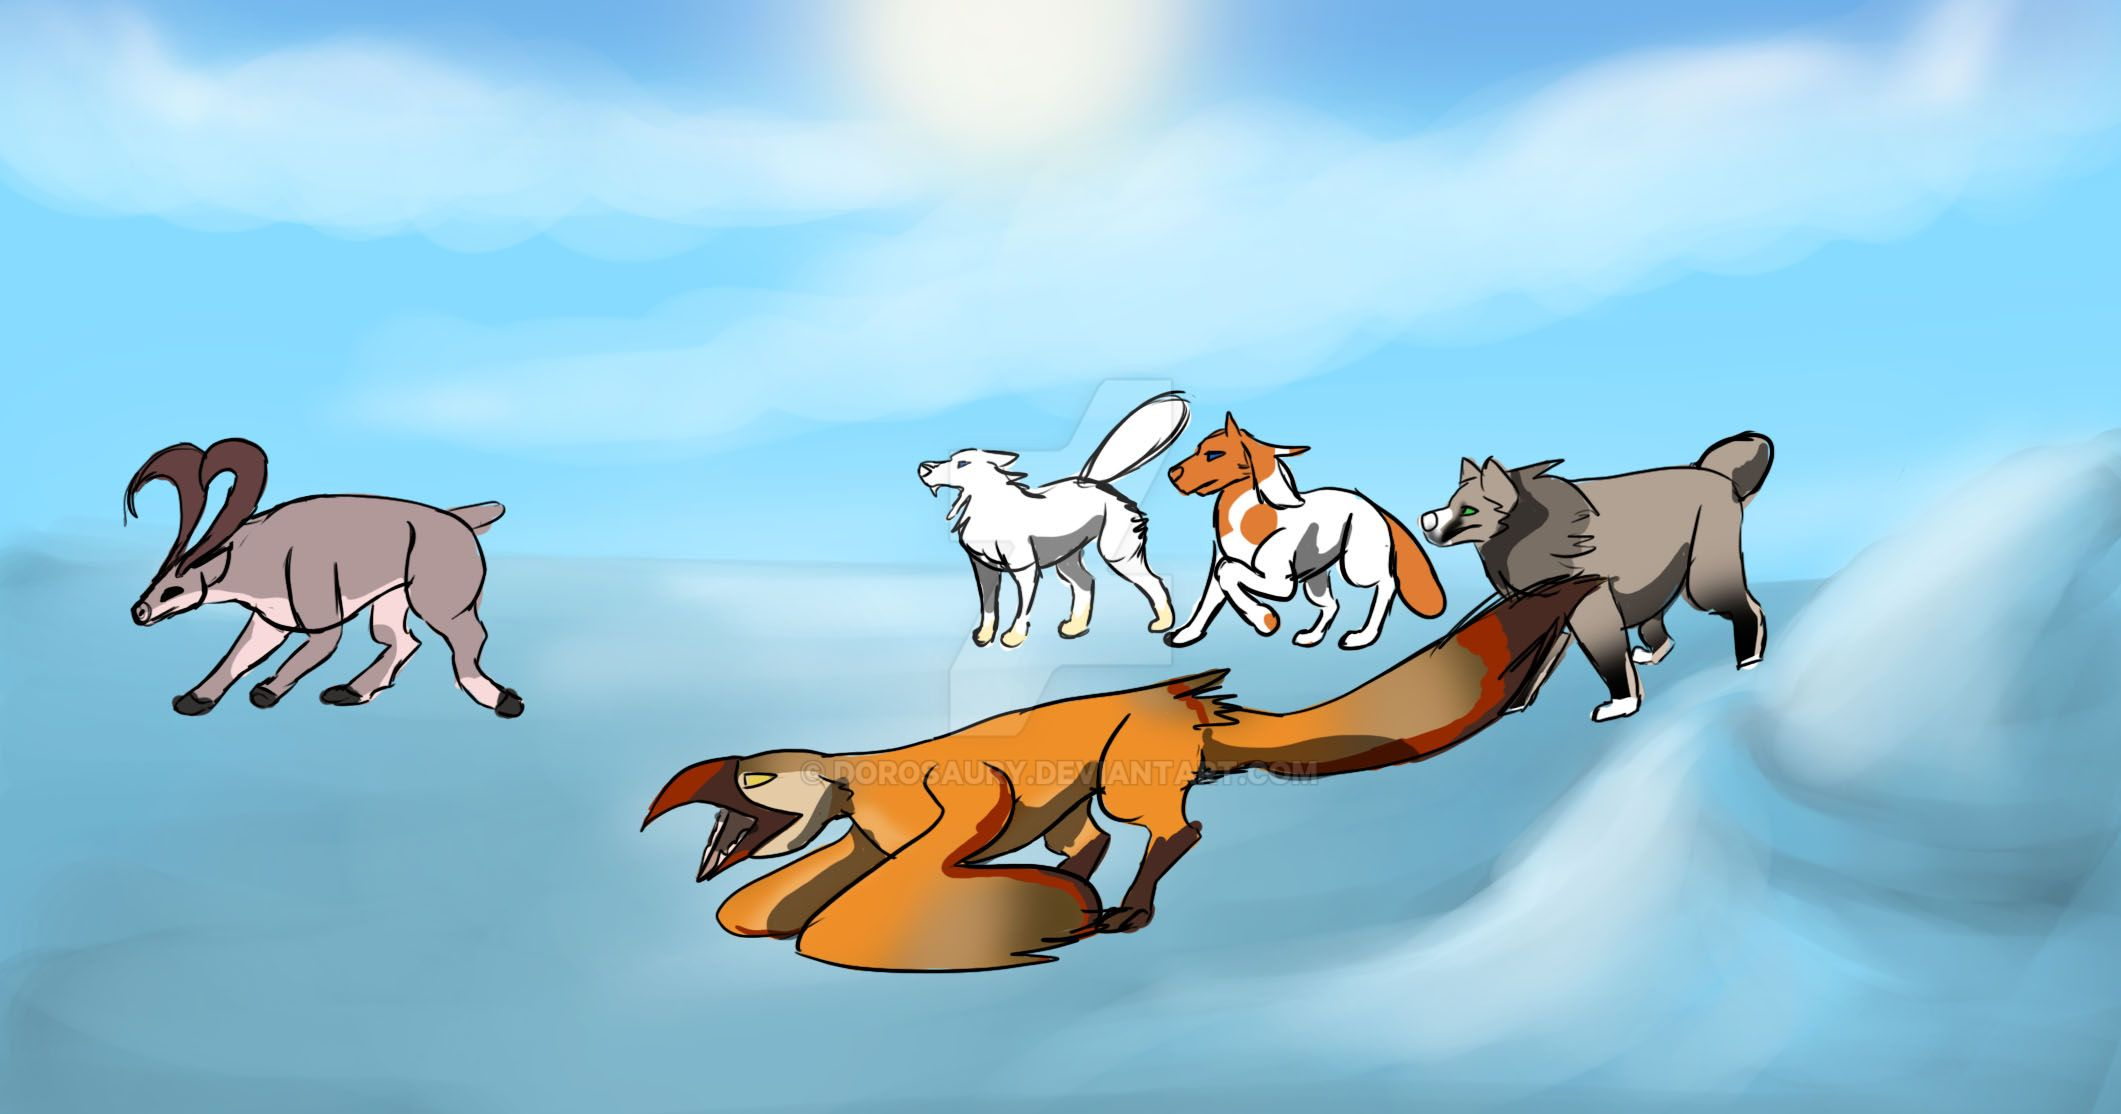 Toko And Stryx Hunt 4-4 by Dorosaury